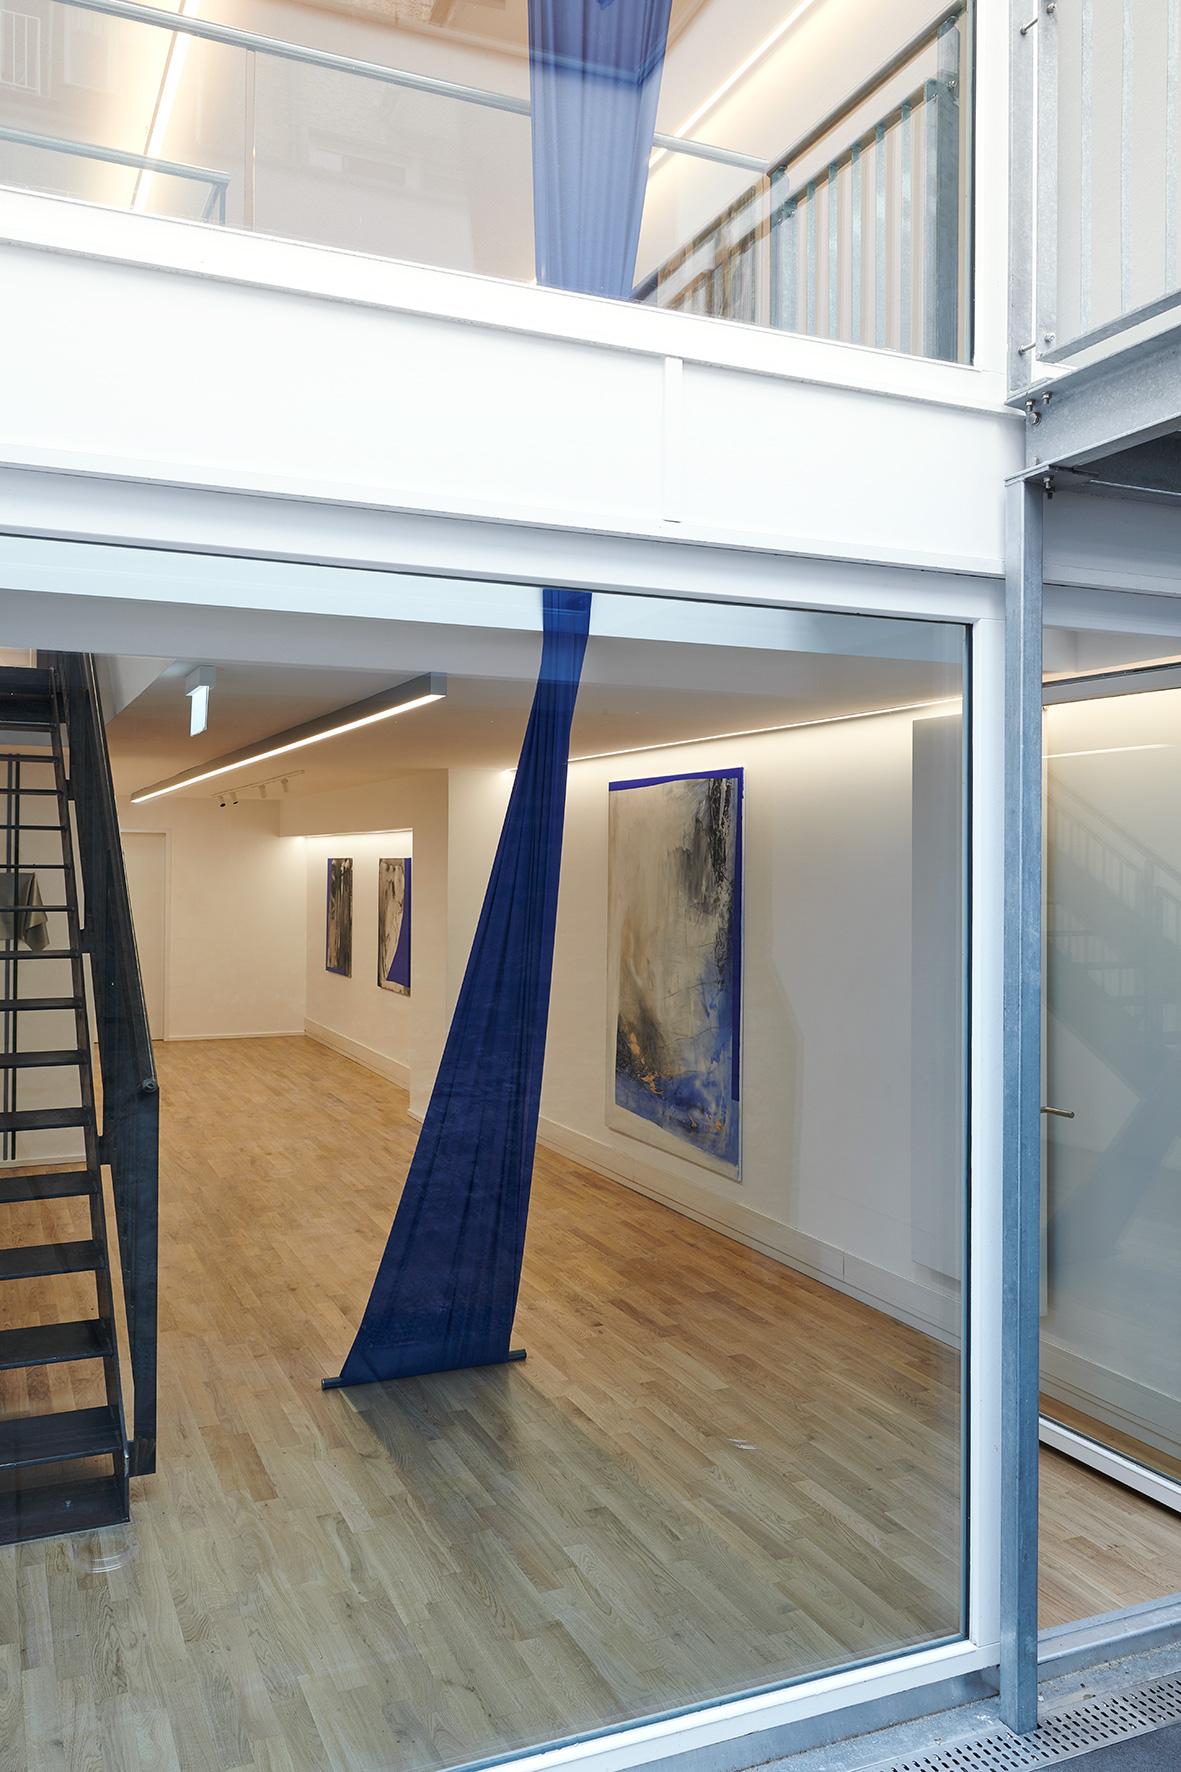 2019.05.08_Galerie-Alber_16.web.jpg